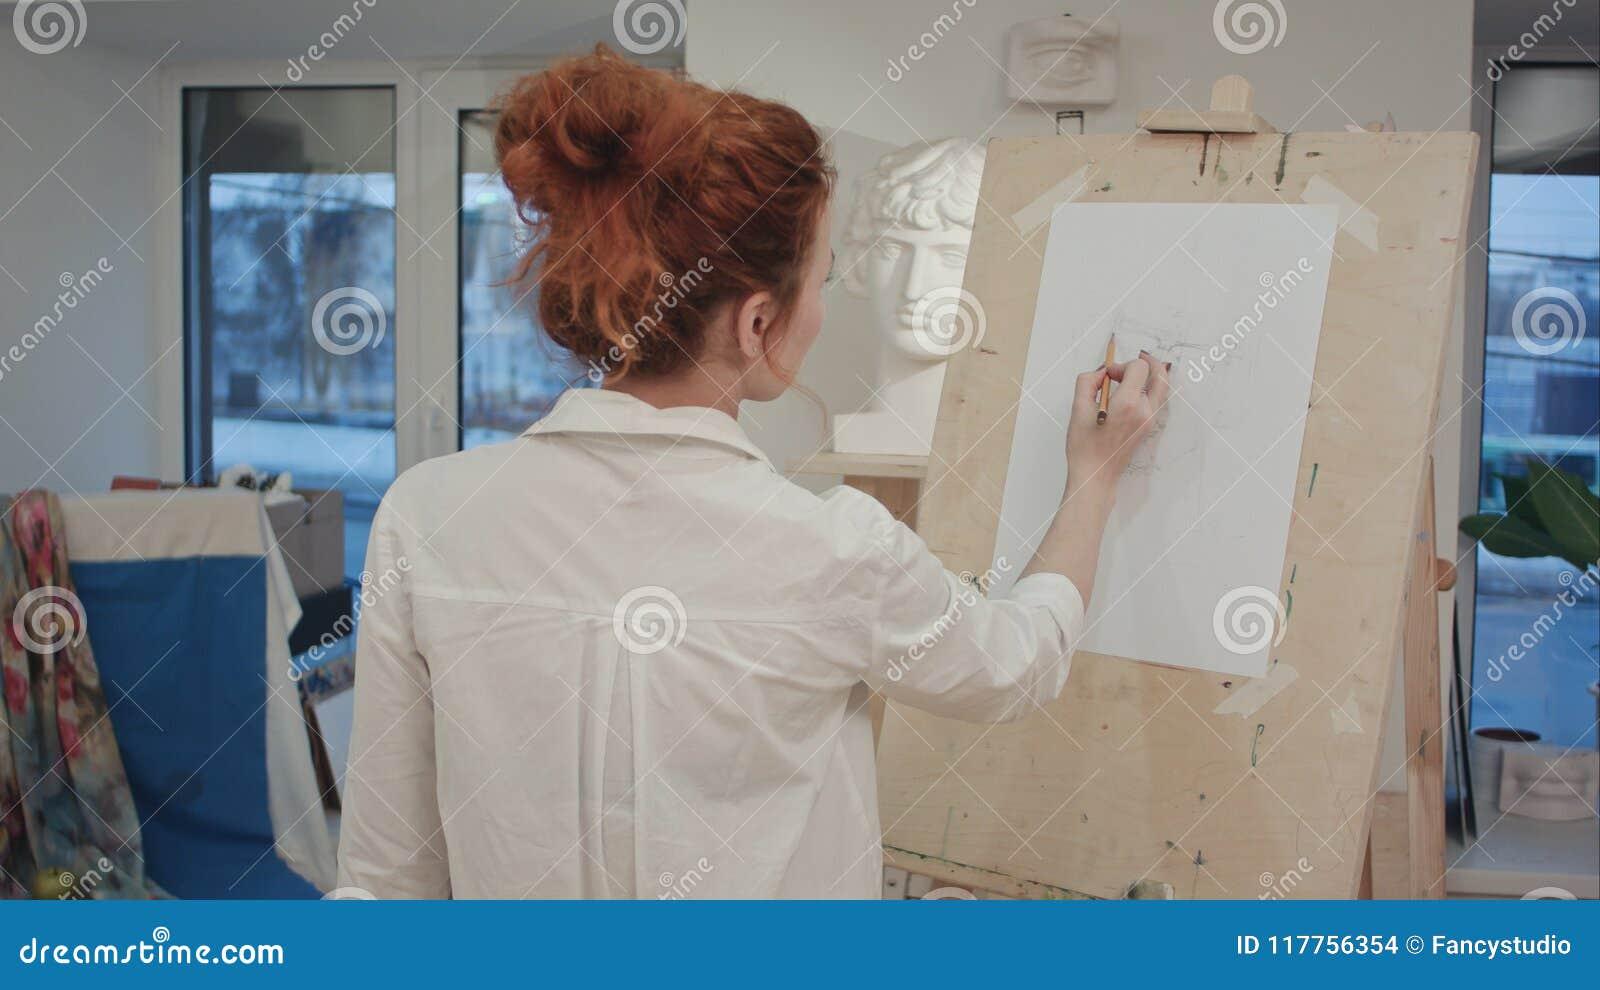 Female Art Student Drawing Plaster Cast On Easel Stock Photo